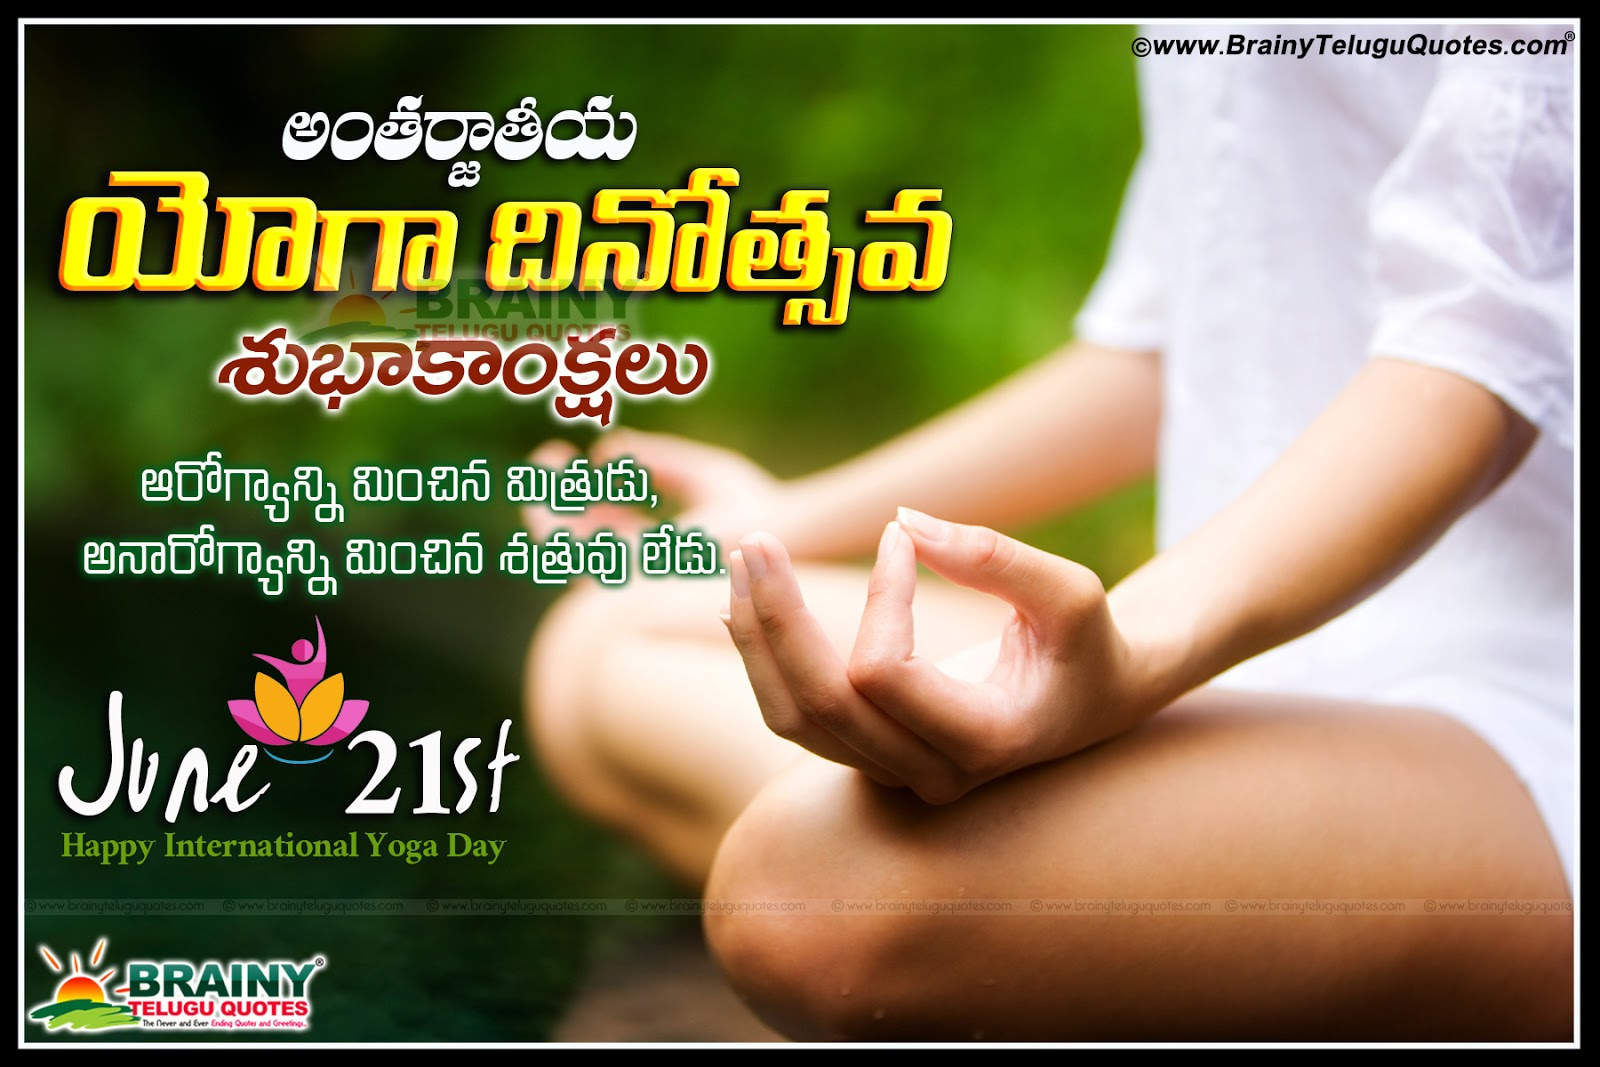 June 21st International Yoga Day Telugu Wishes Brainyteluguquotes Comtelugu Quotes English Quotes Hindi Quotes Tamil Quotes Greetings